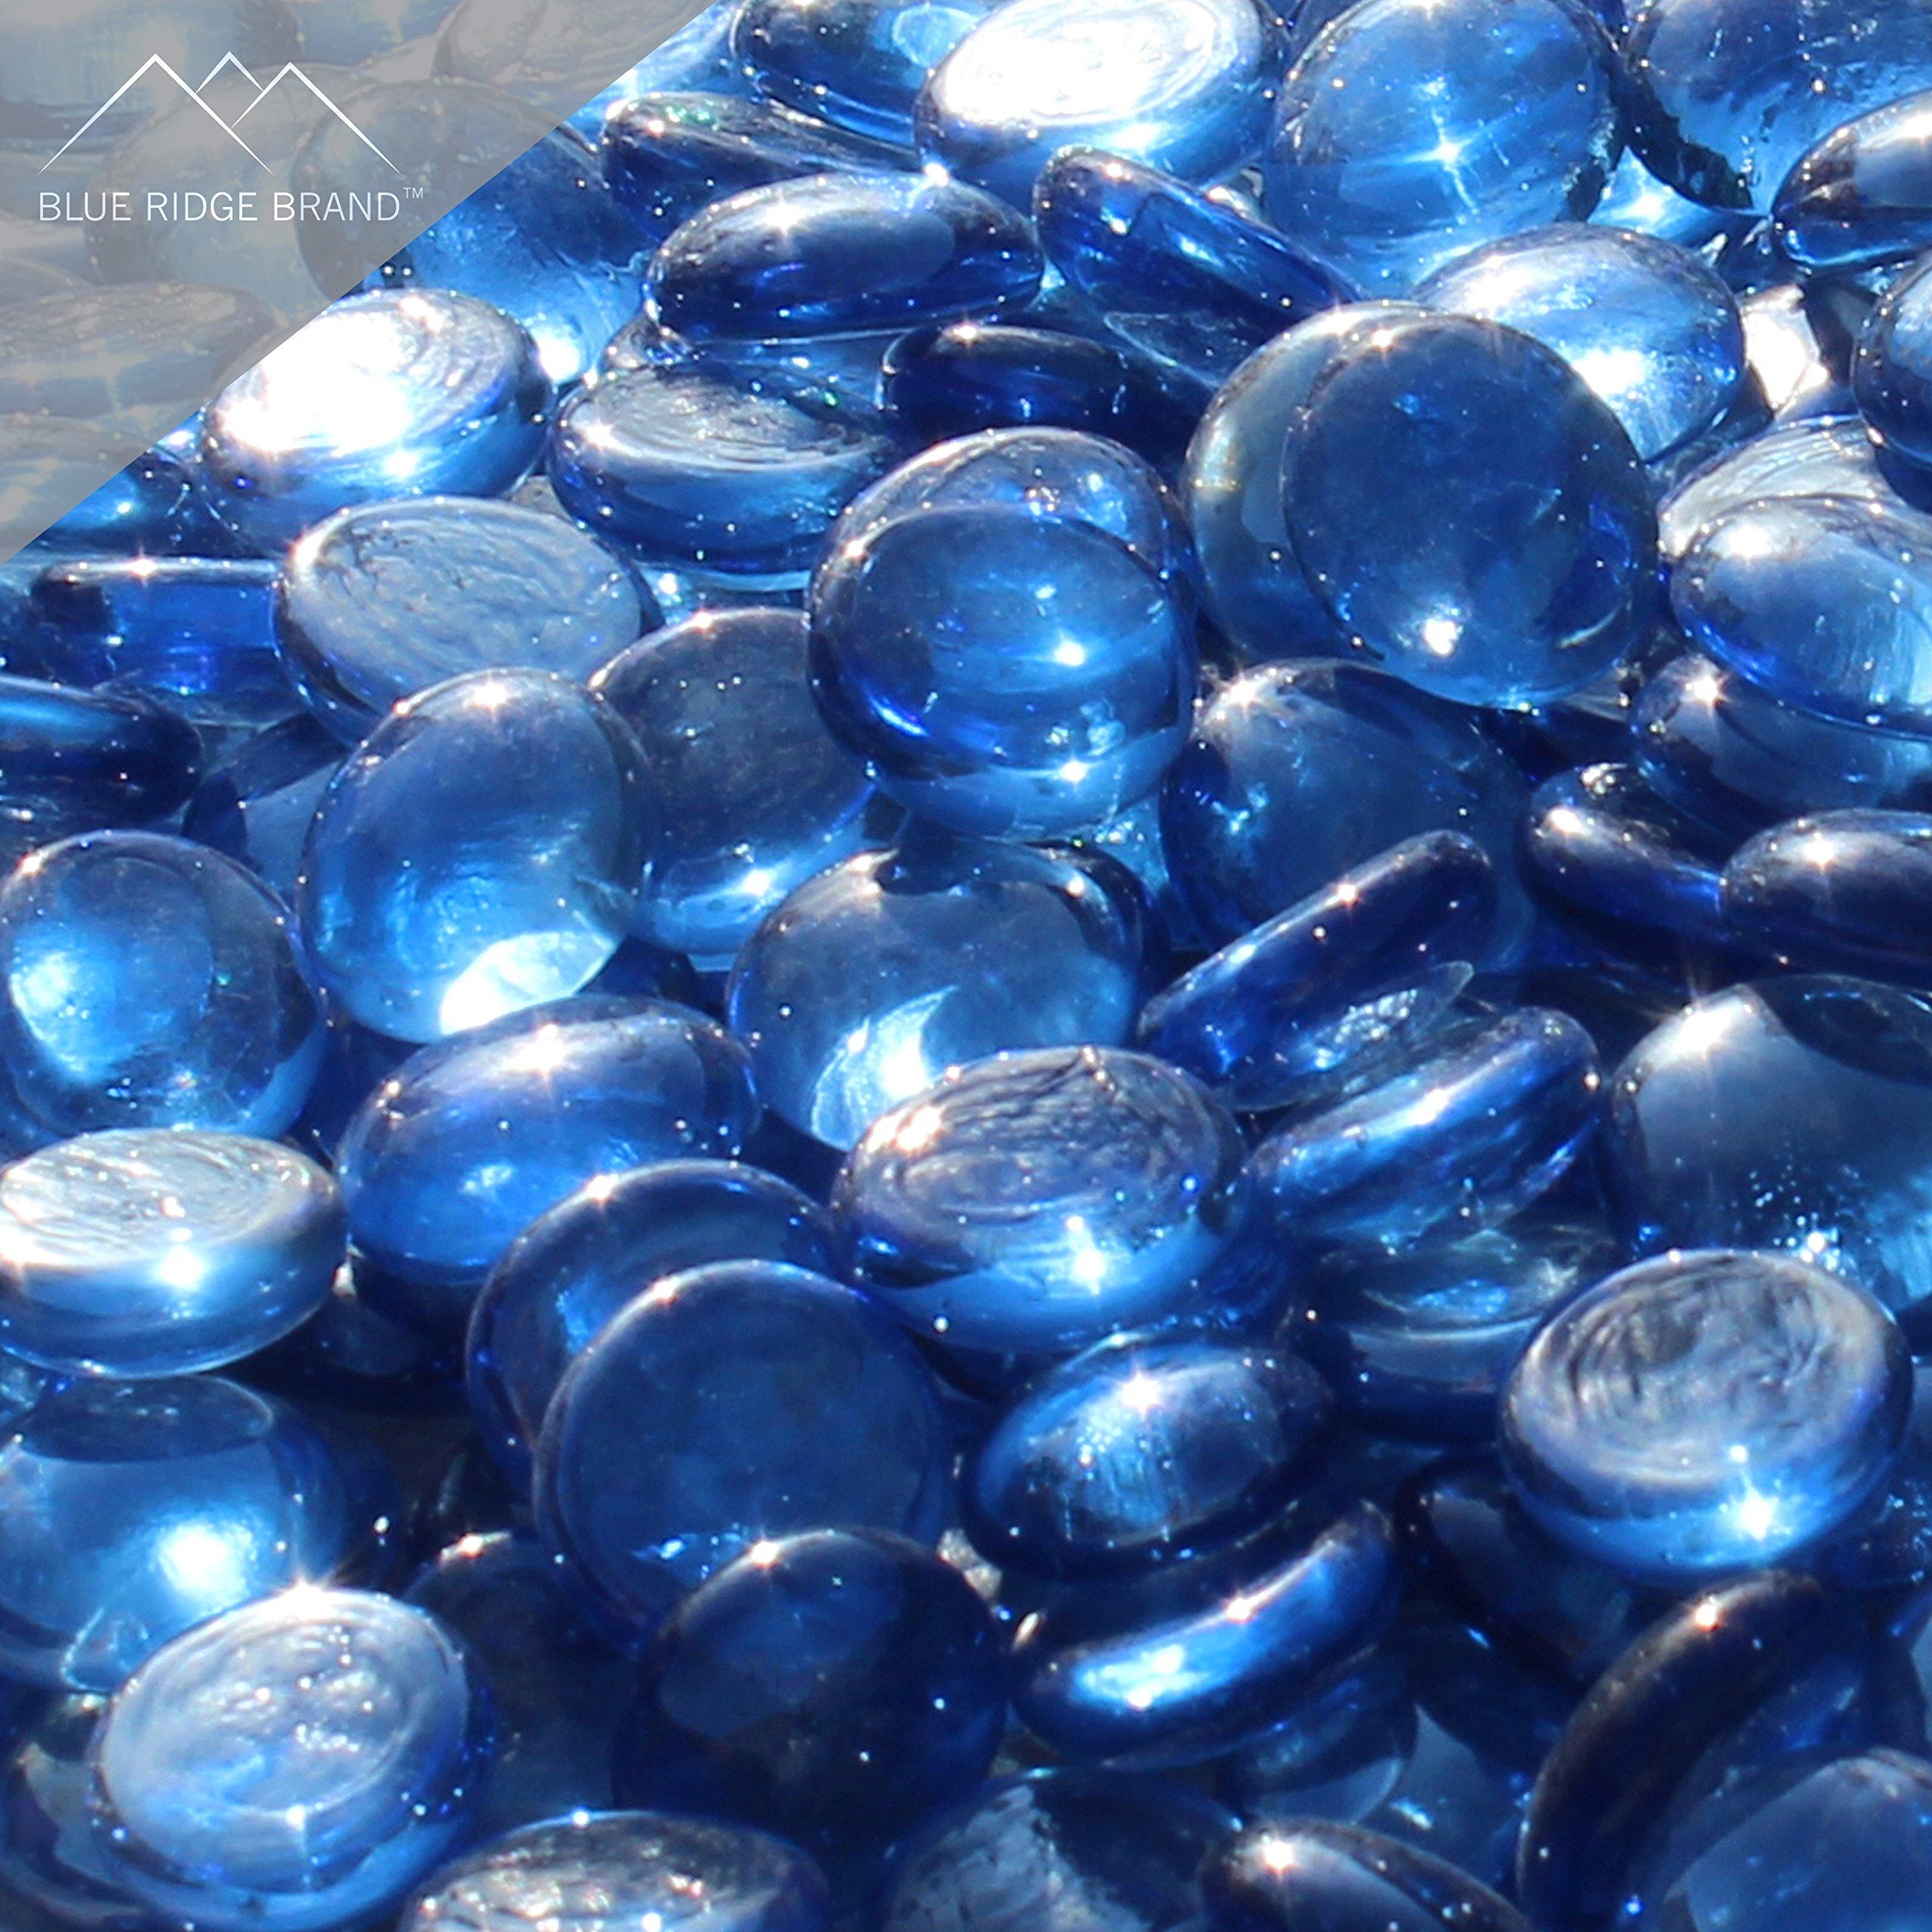 Blue Ridge Brand trade; Light Blue Reflective Fire Glass Beads - 5-Pound Professional Grade Fire Pit Glass - 3/4 Reflective Glass for Fire Pit and Landscaping by Blue Ridge Brand